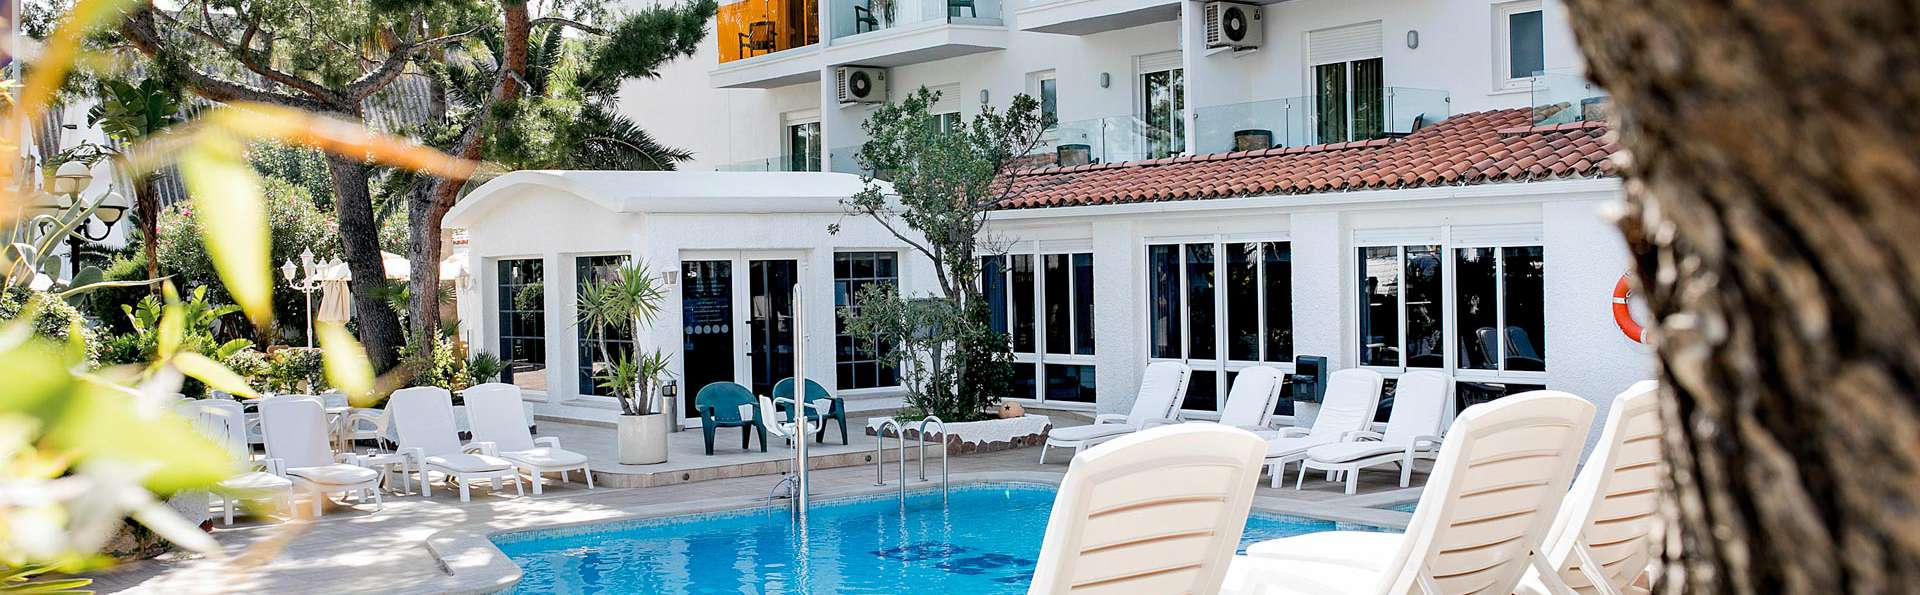 Hotel Bersoca - EDIT_NEW_POOL_02.jpg